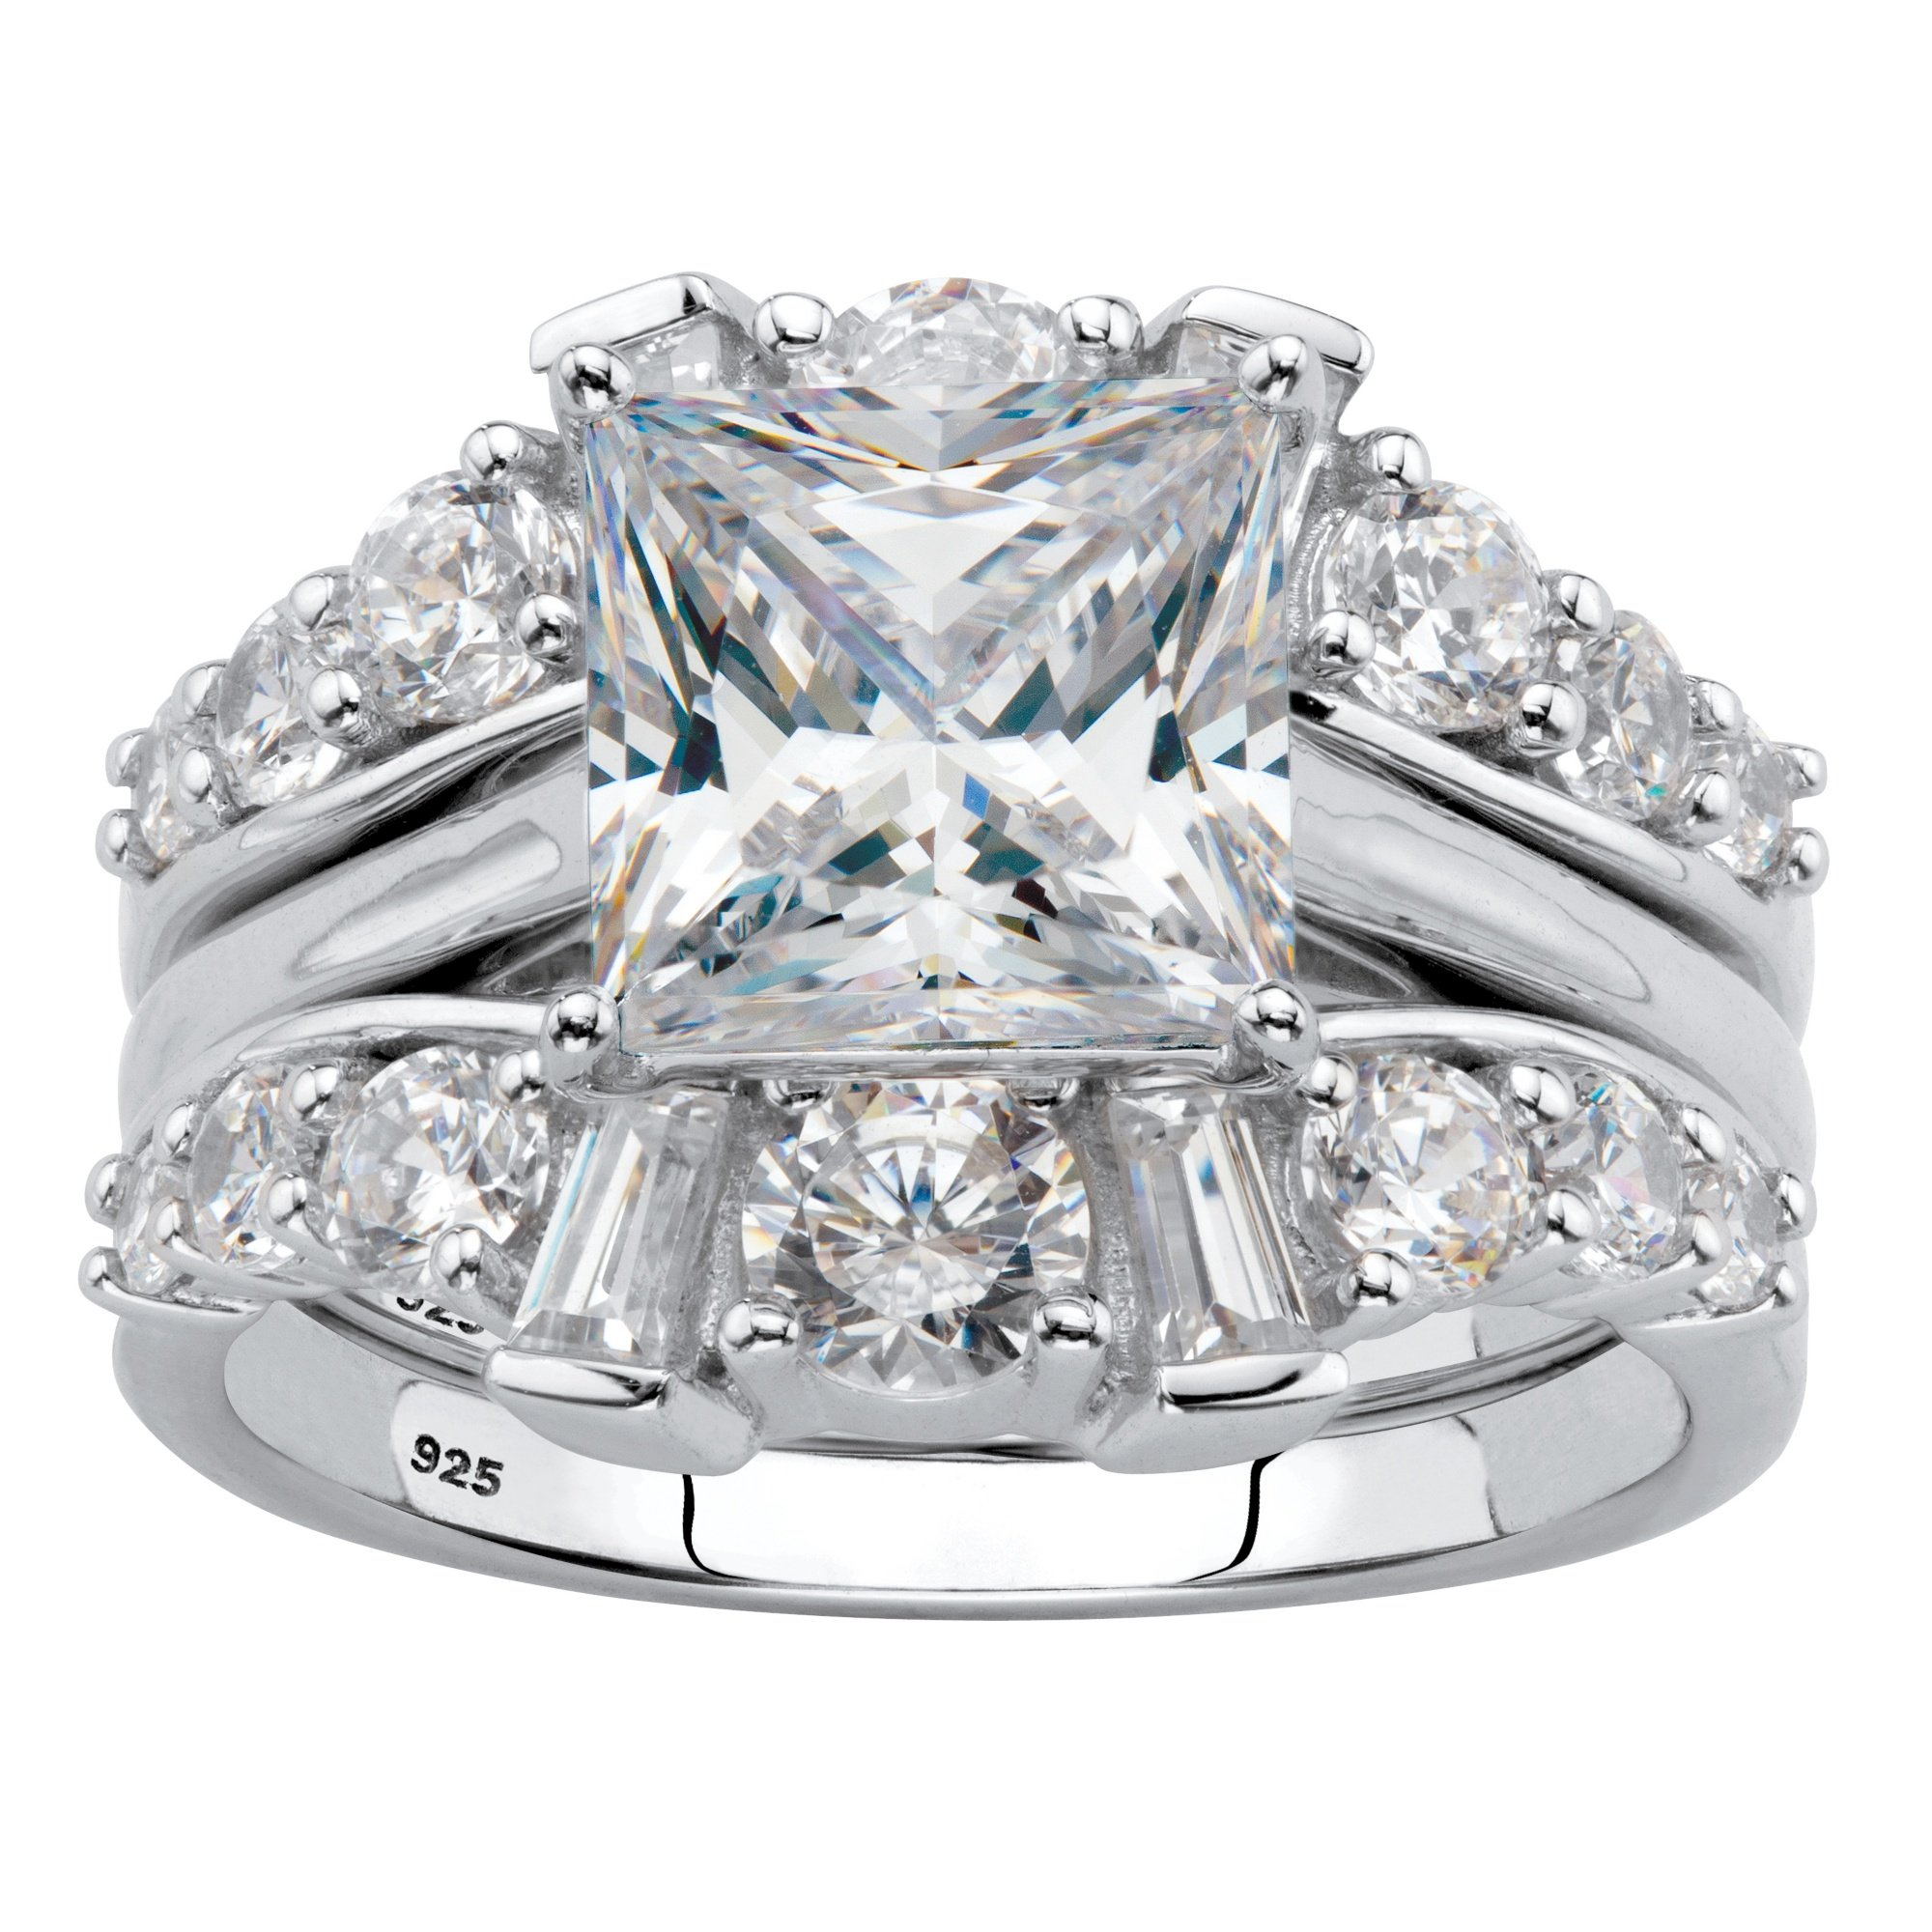 Platinum over Sterling Silver Princess Cut Cubic Zirconia Jacket Bridal Ring Set Size 6